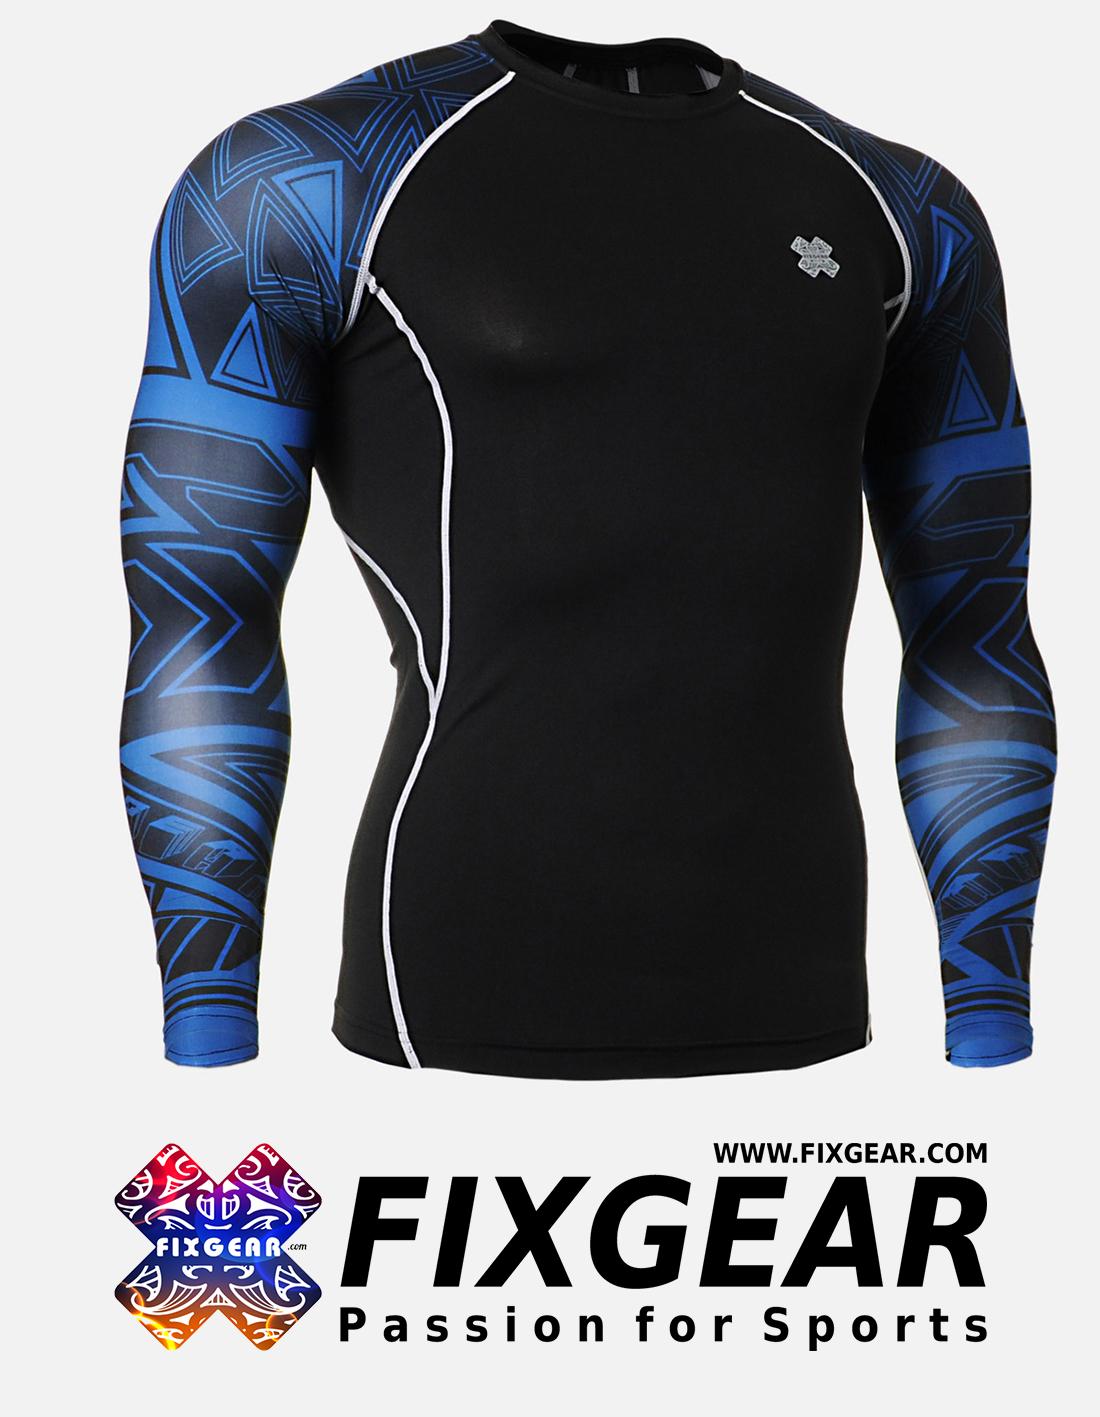 FIXGEAR CPD-B1 Compression Base Layer Shirt